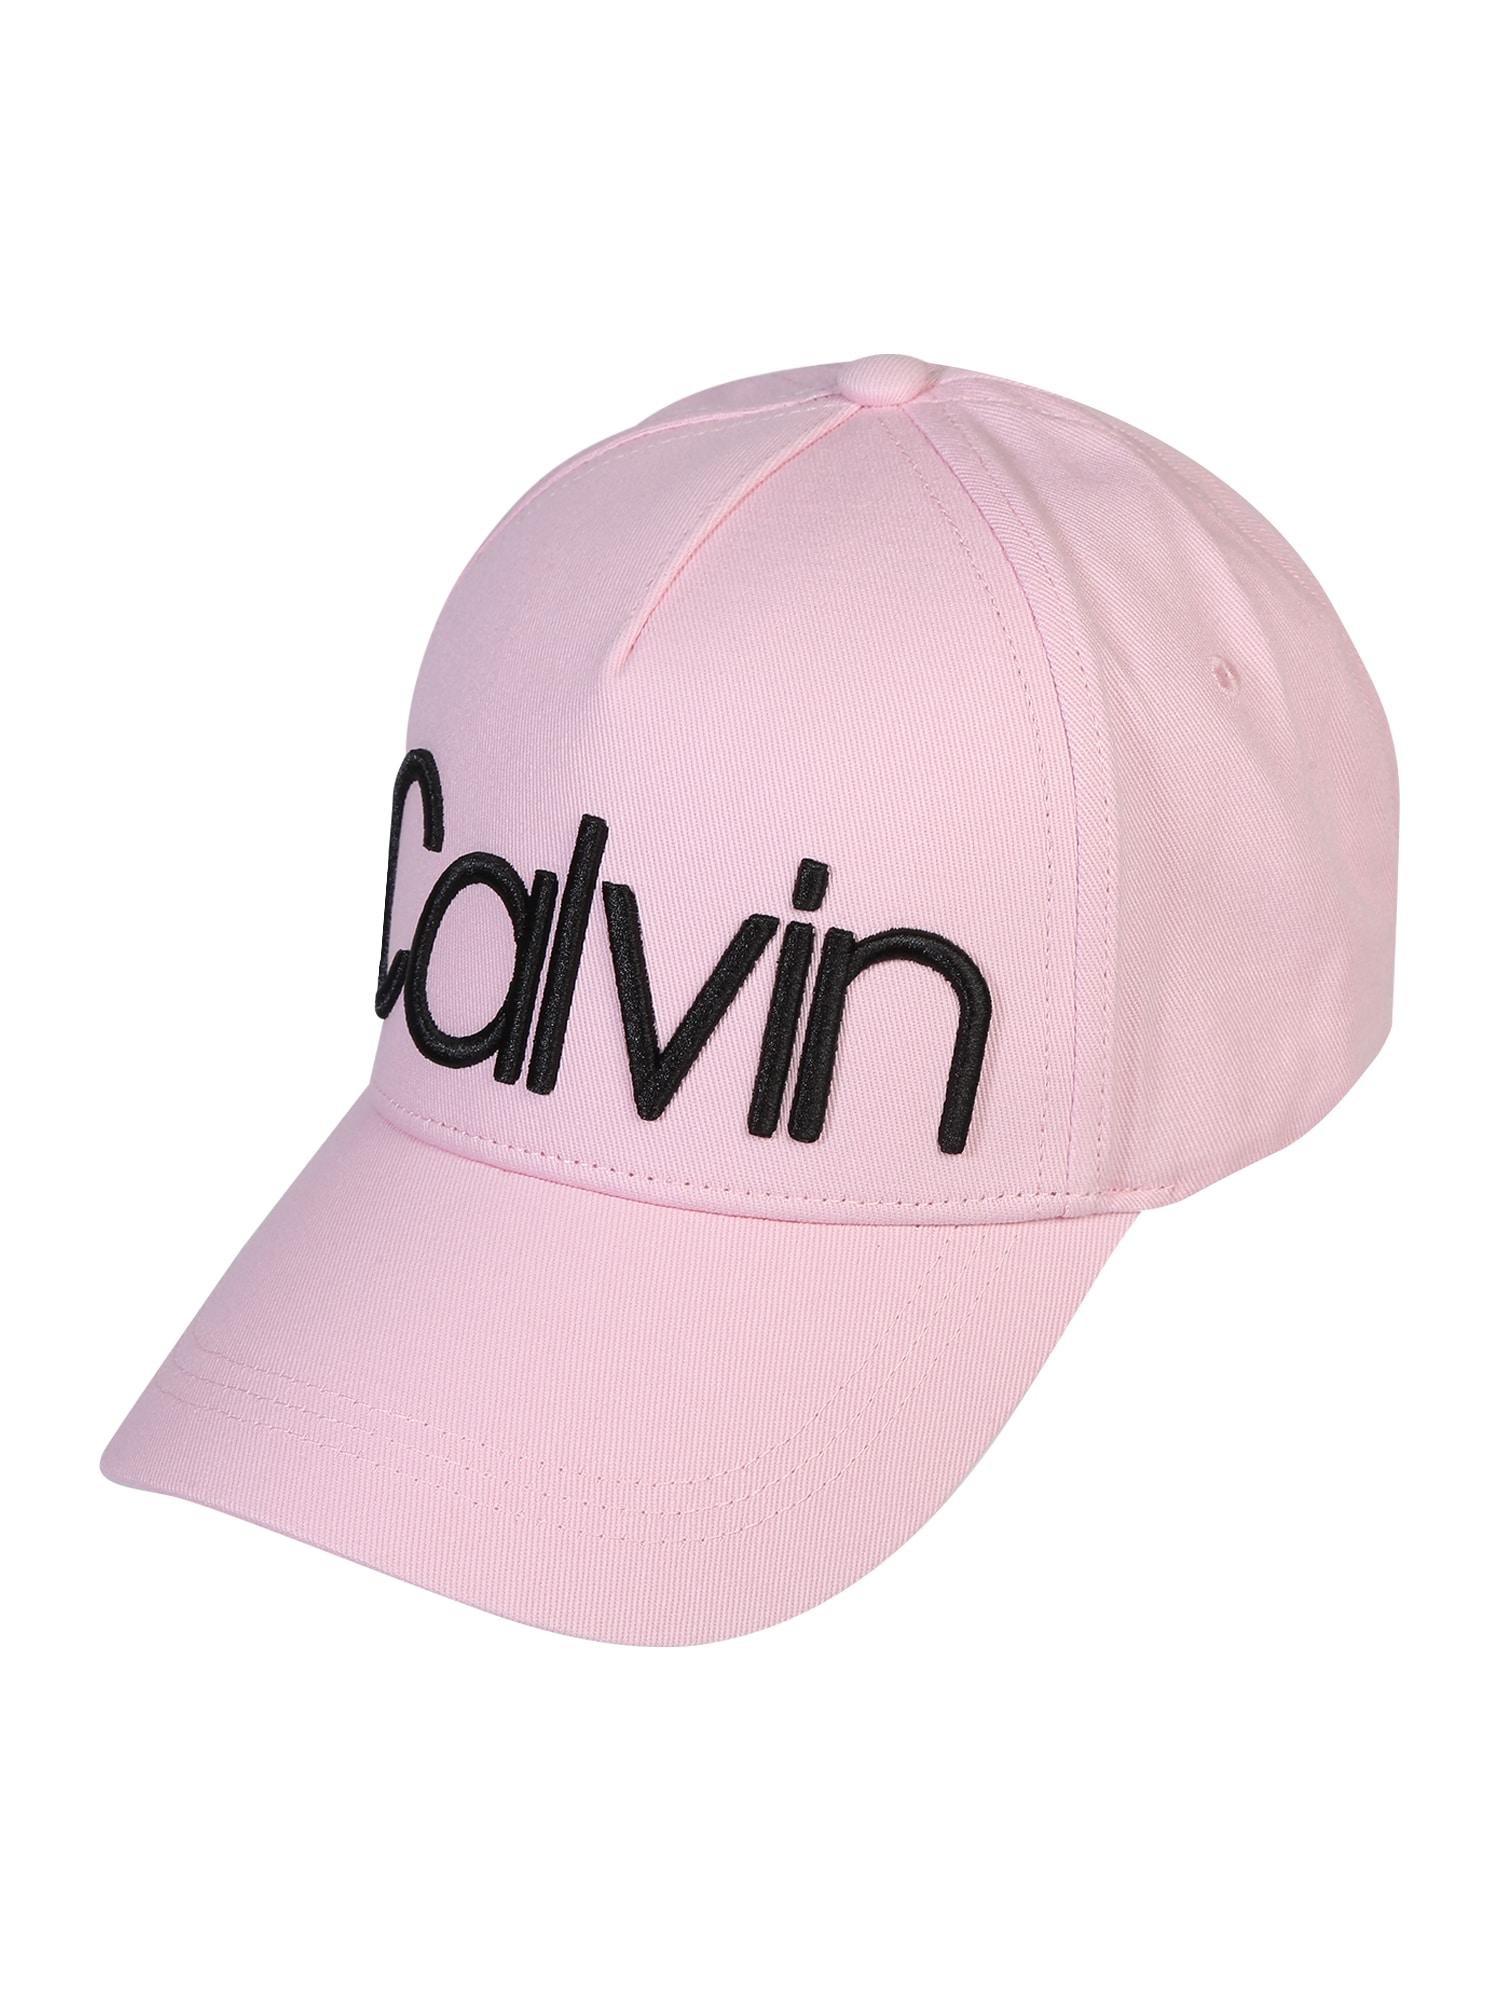 Cap | Accessoires > Caps > Sonstige Caps | Pink | Calvin Klein